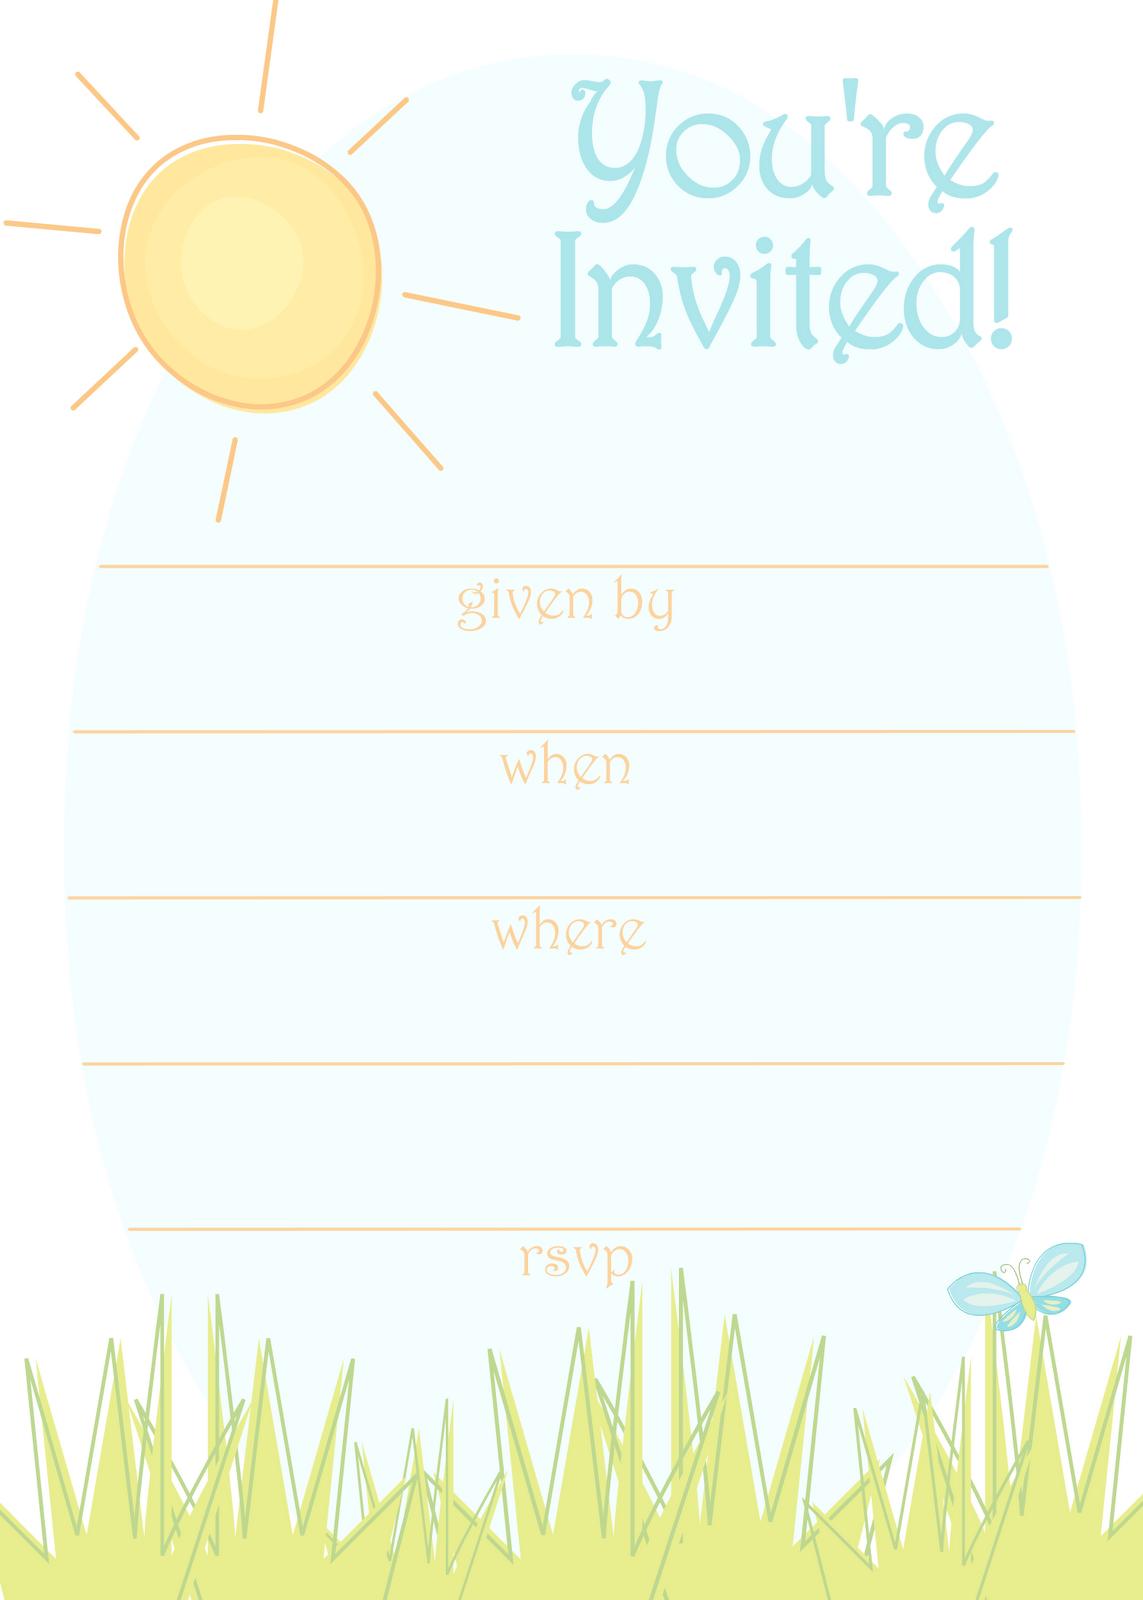 birthday party invitation maker free printable kids birthday party invitations templates - Free Printable Kids Birthday Party Invitations Templates